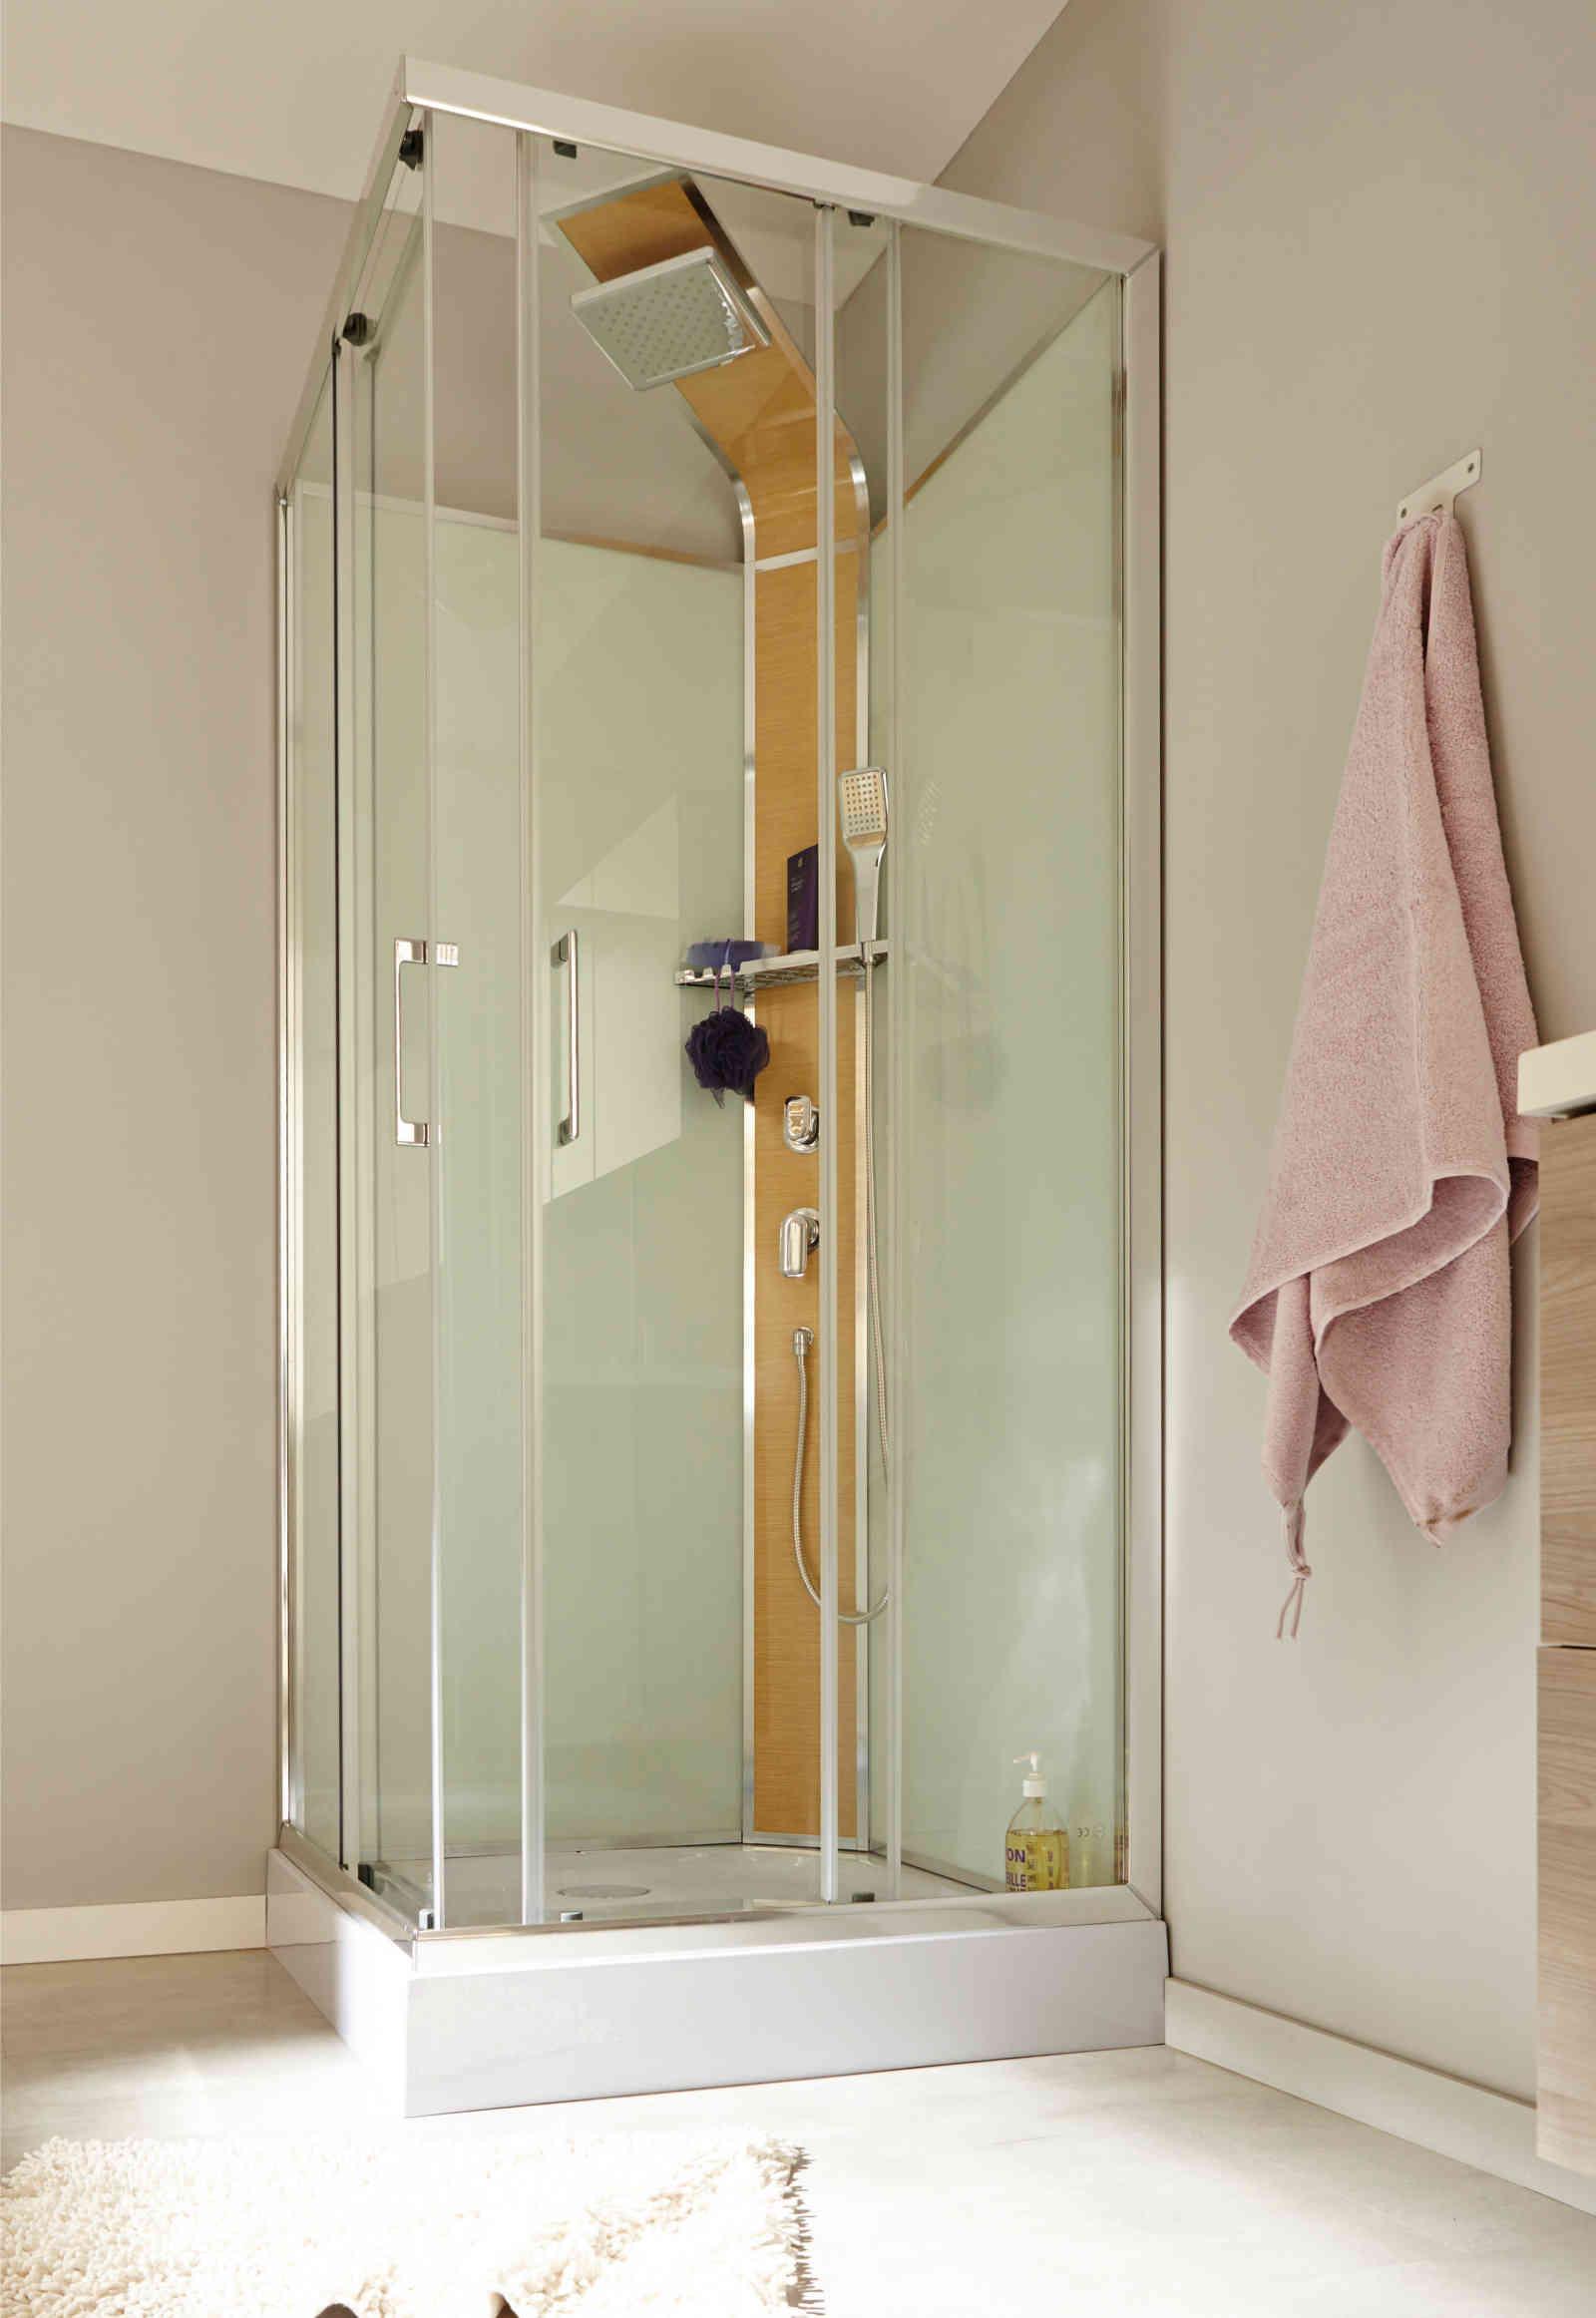 Robinet mitigeur mural salle de bain for Equipement salle de bain douche